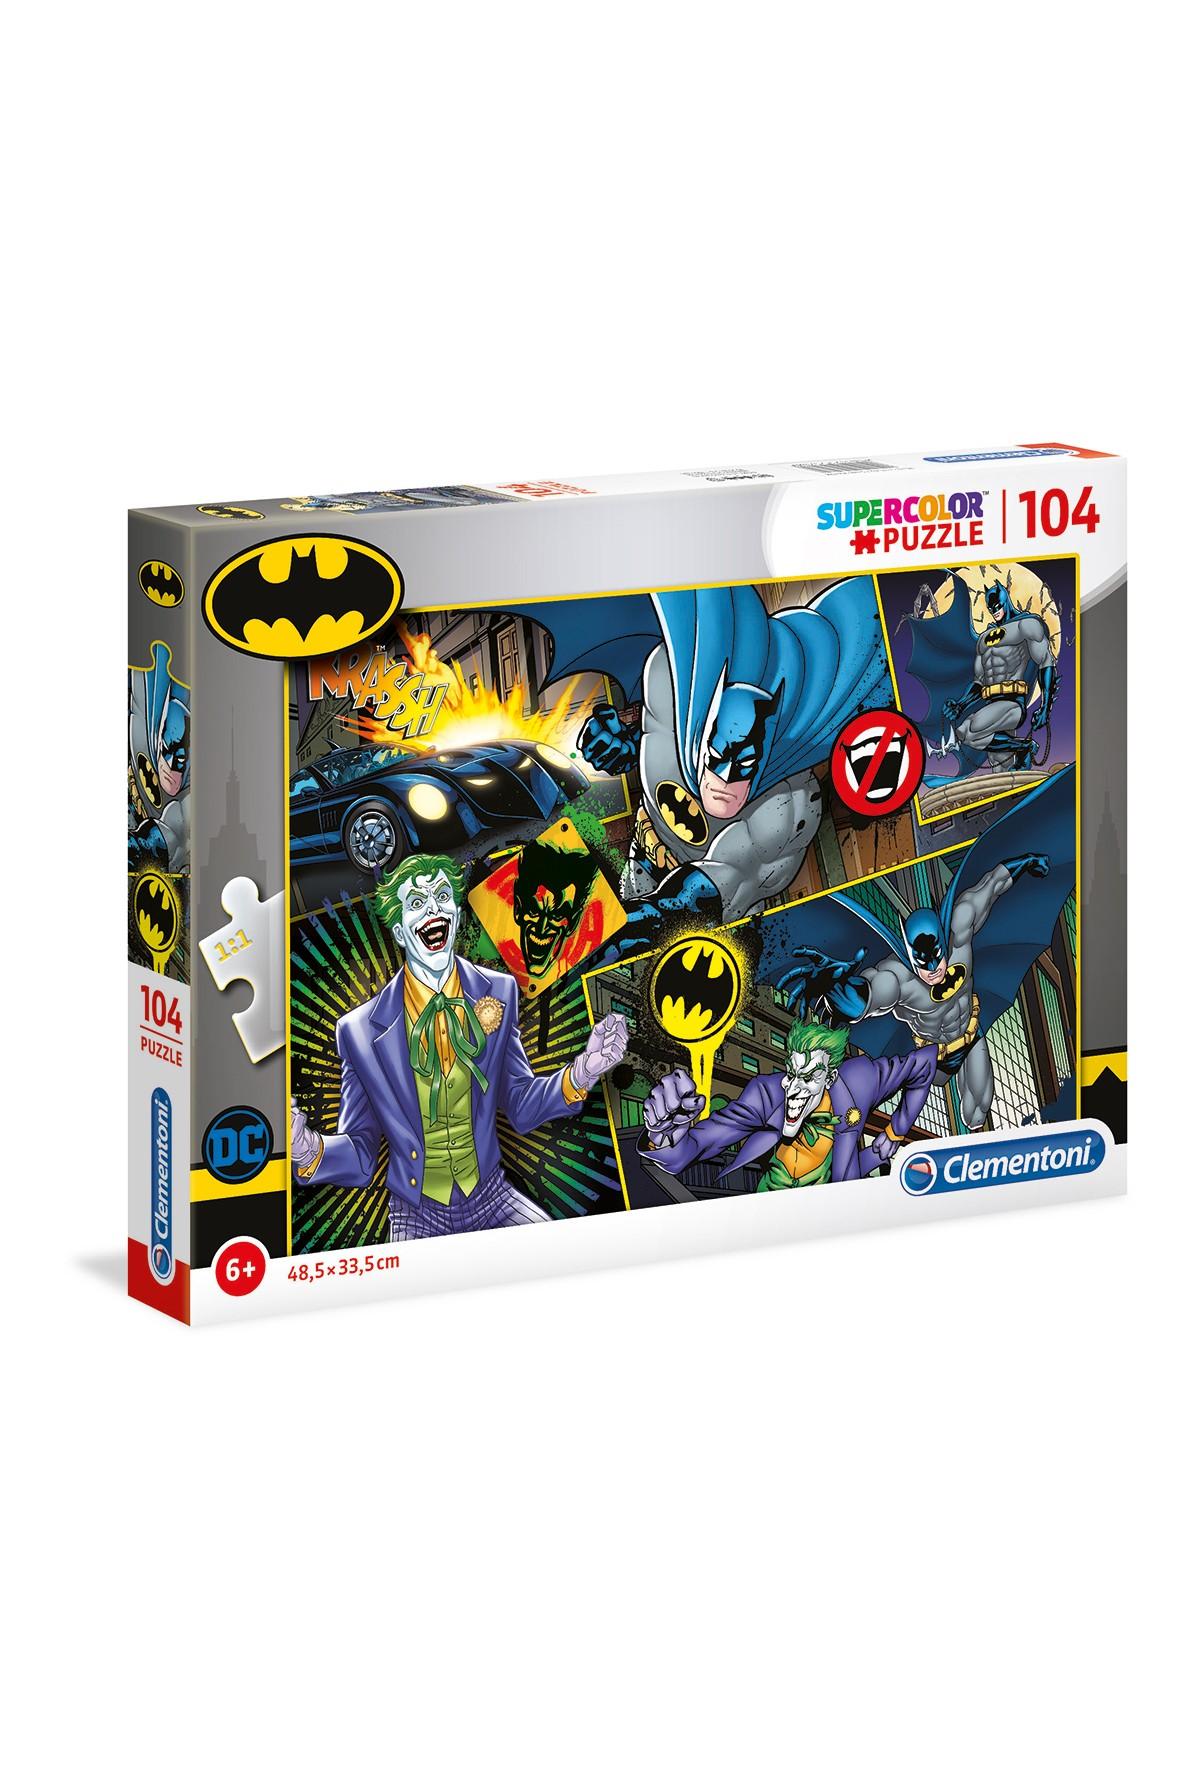 Puzzle Batman Clementoni-104 elementy wiek 6+